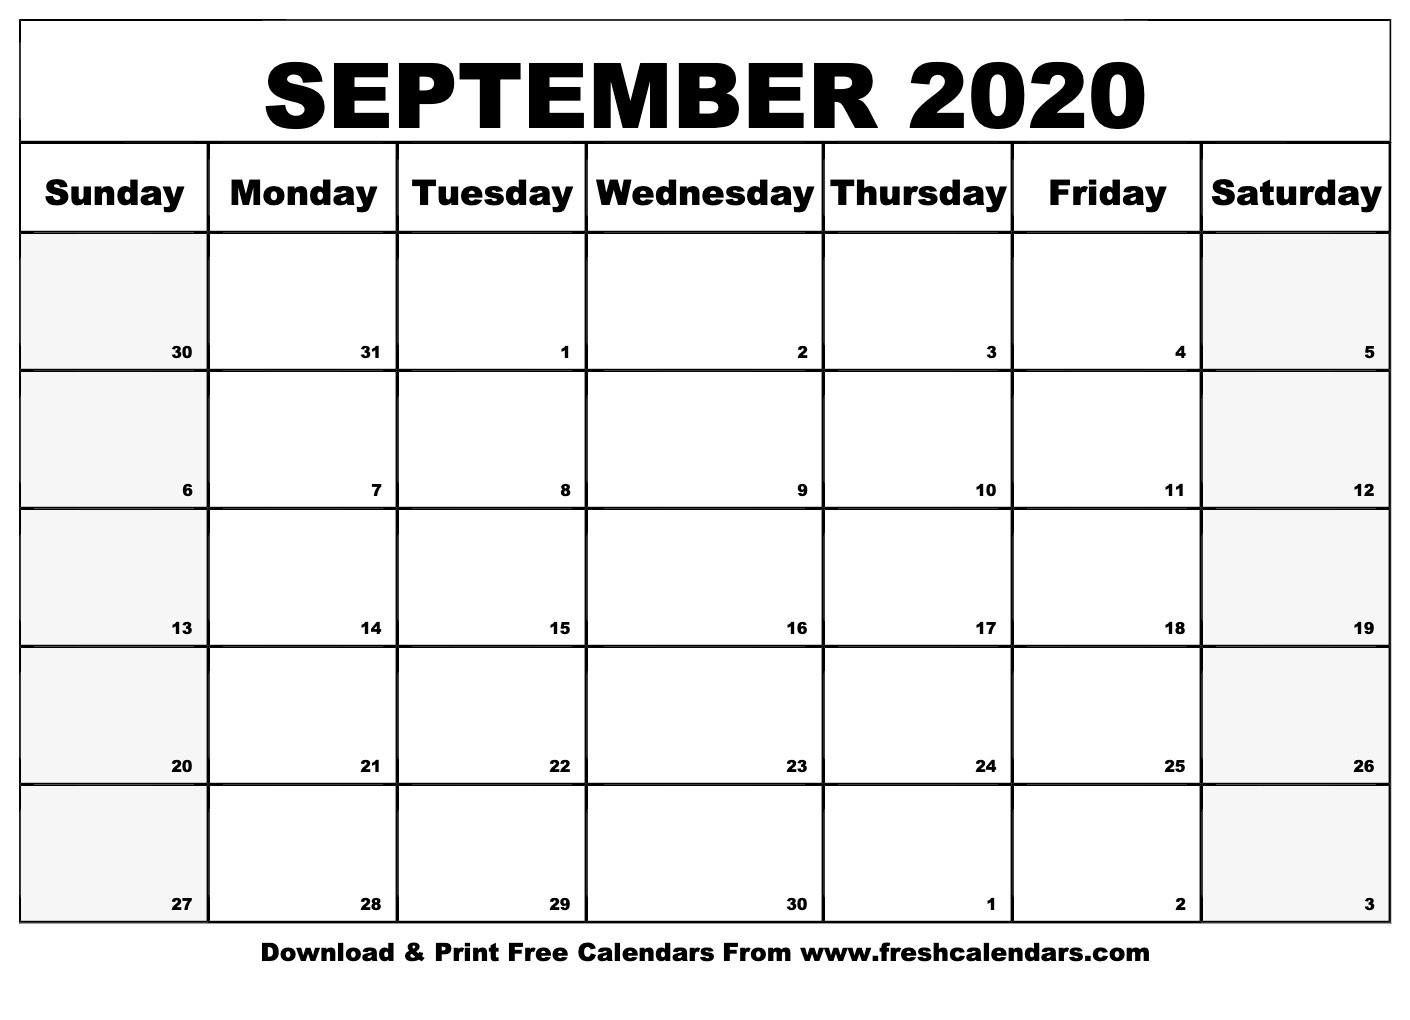 September 2020 Calendar Printable - Fresh Calendars-Monday Through Friday September Calendar Template 2020